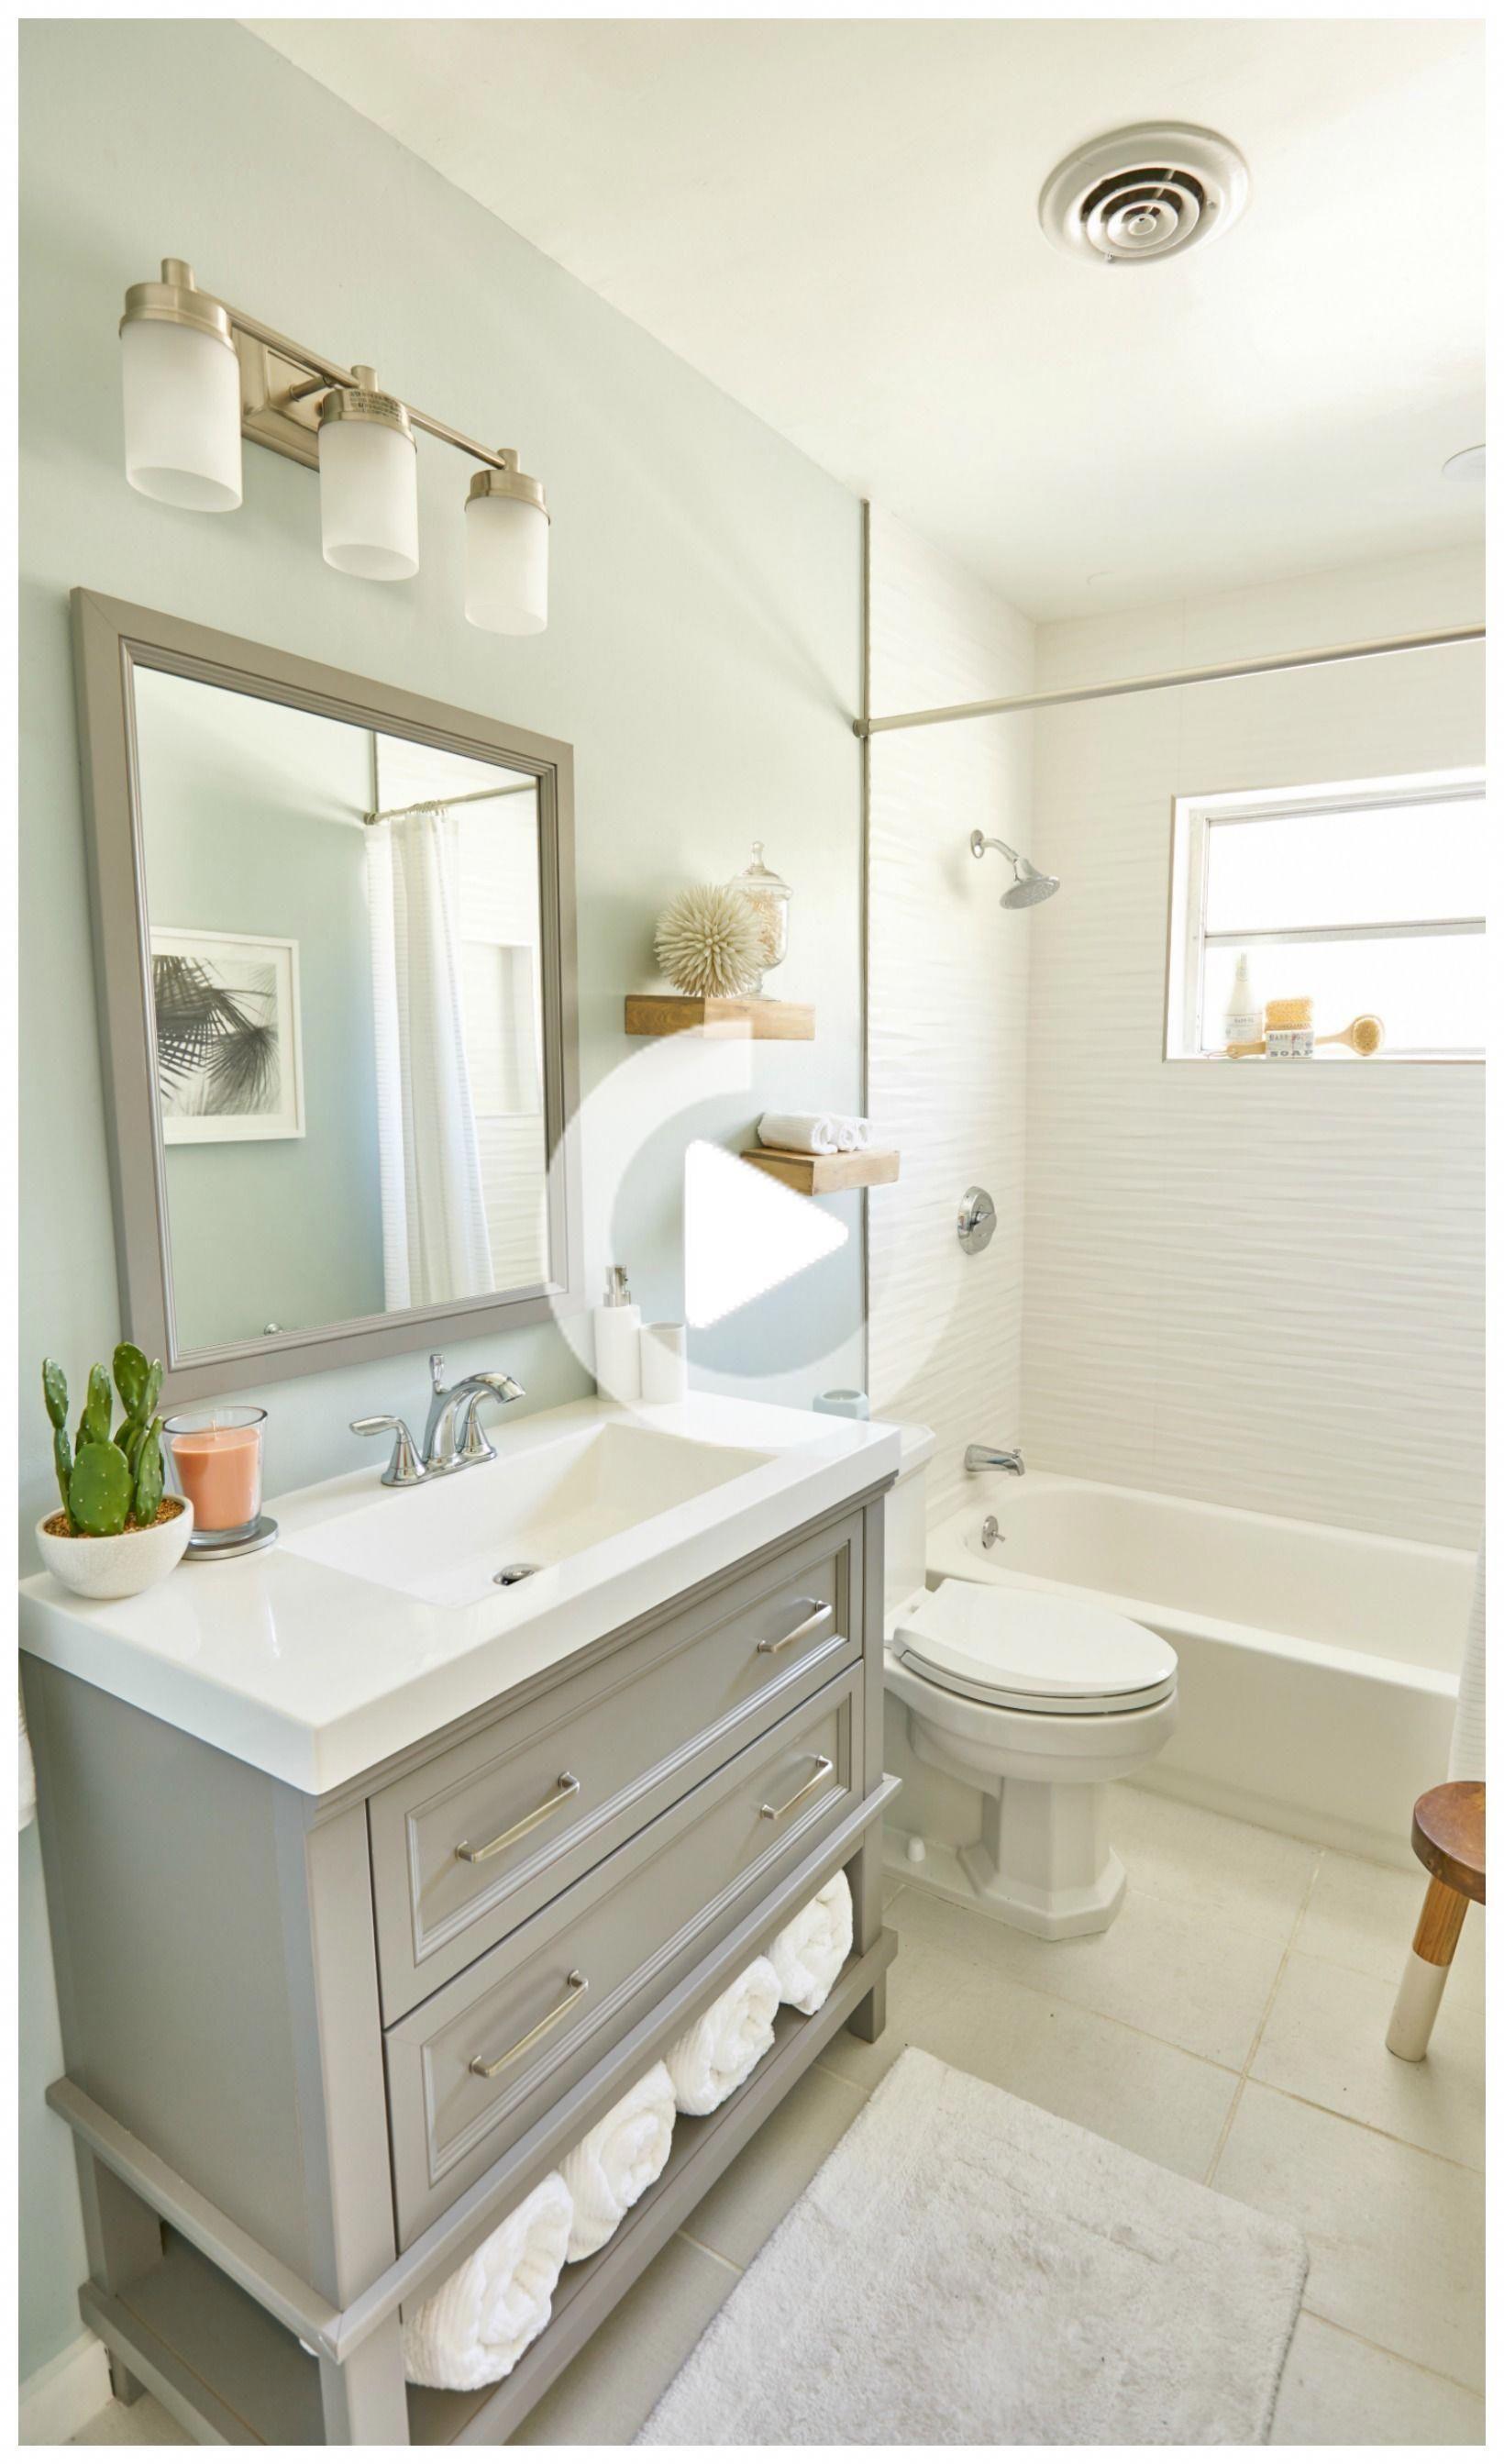 8 Ways To Make A Small Bathroom Look Bigger Small Bathroom Bathrooms Remodel Small Bathroom Remodel